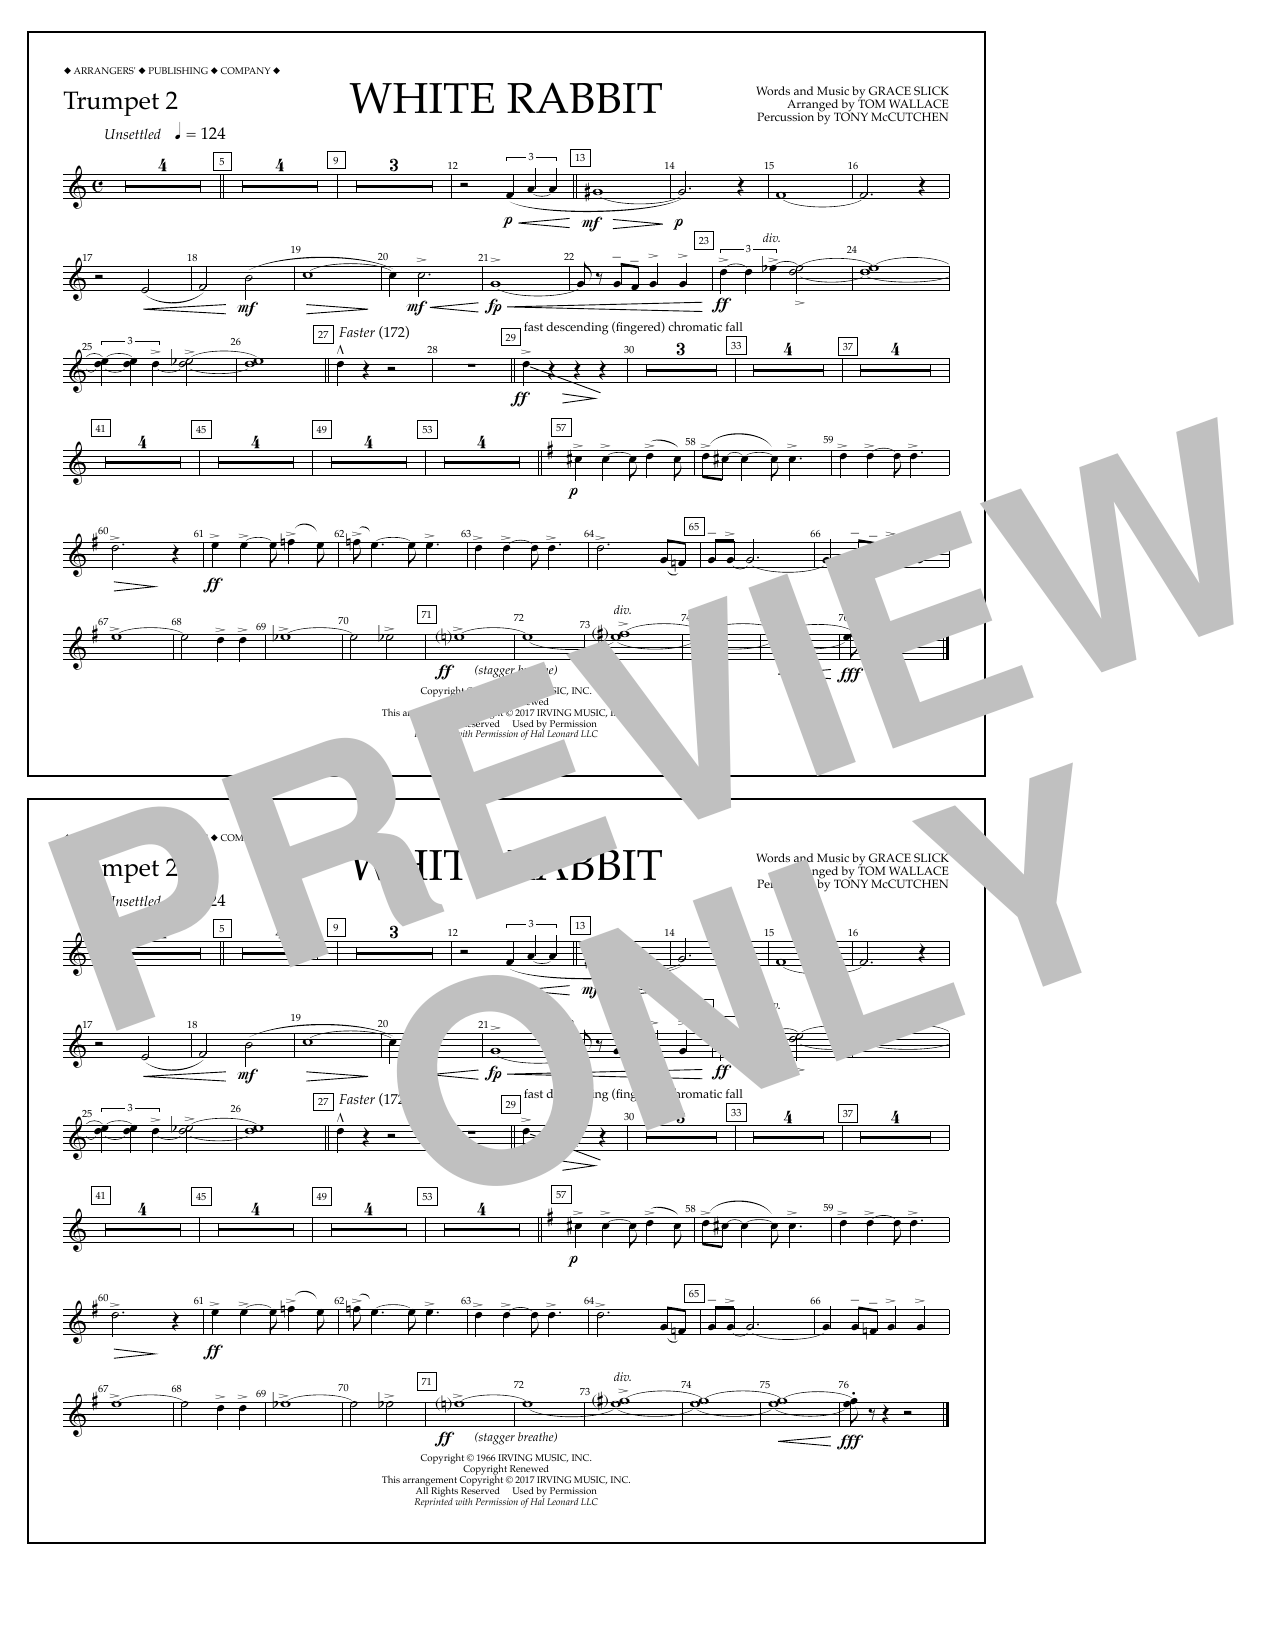 White Rabbit - Trumpet 2 Sheet Music